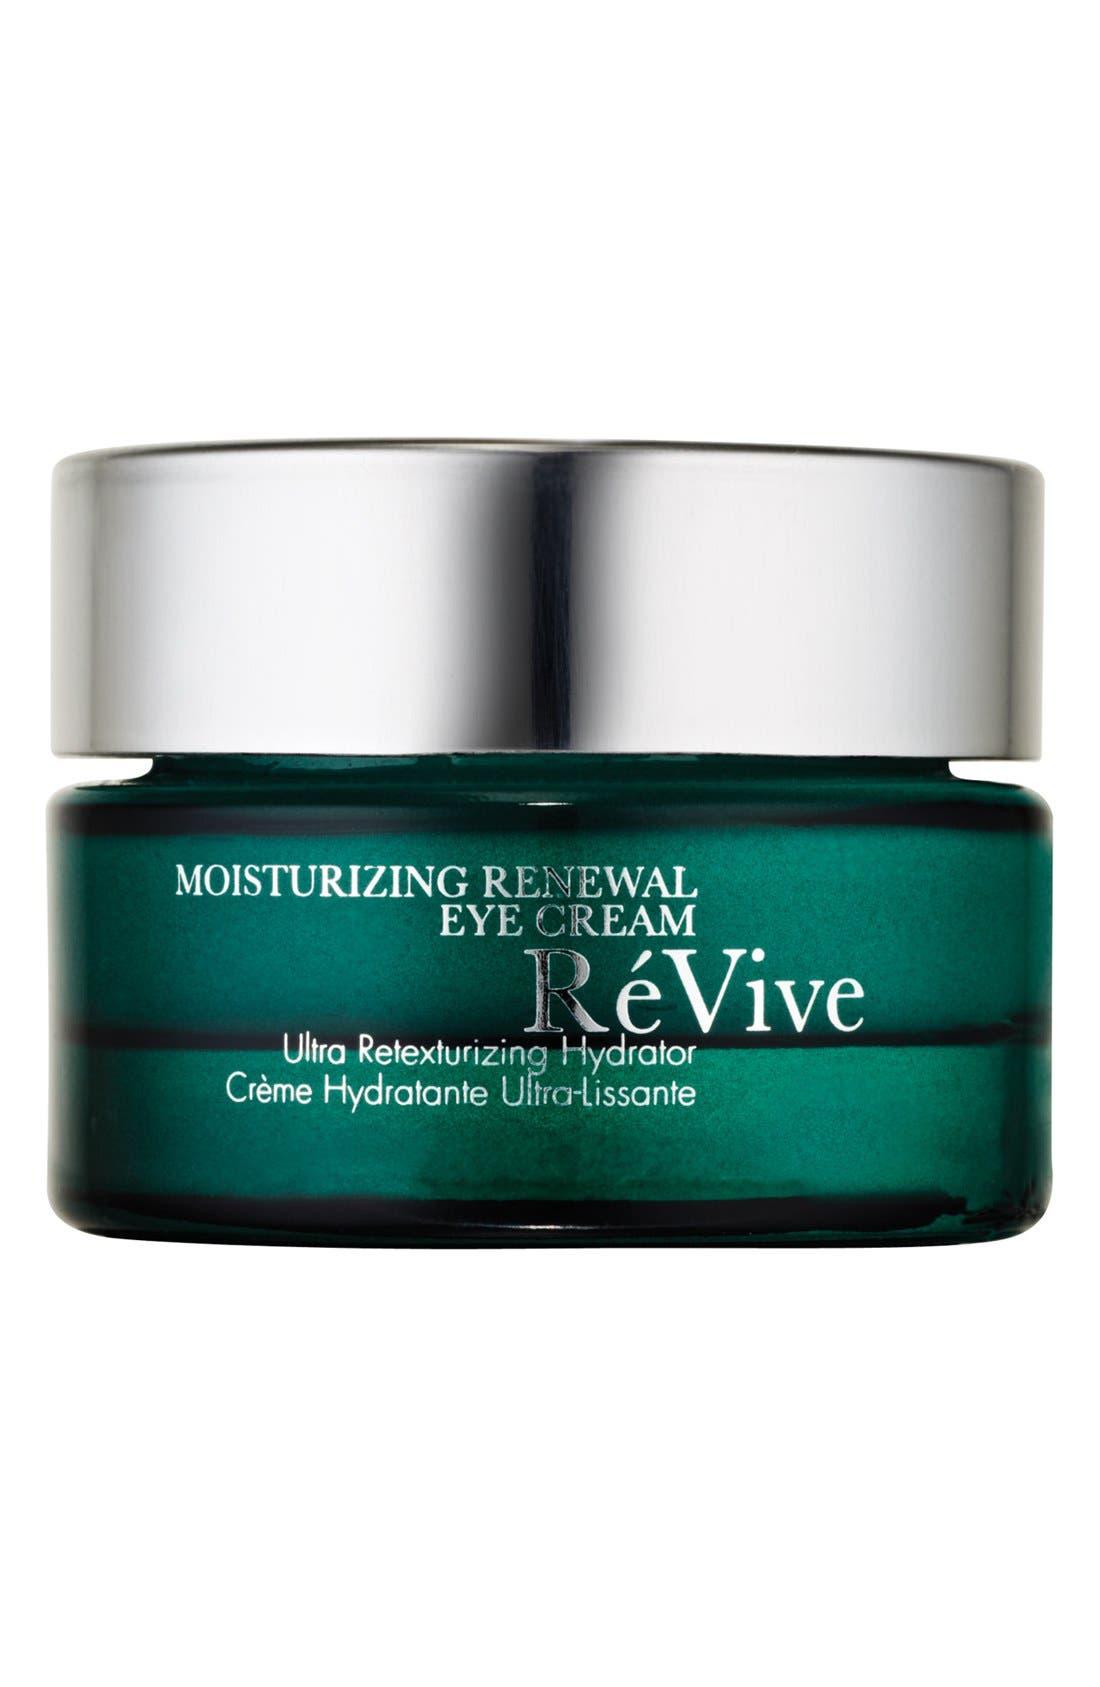 Moisturizing Renewal Eye Cream,                             Main thumbnail 1, color,                             NO COLOR